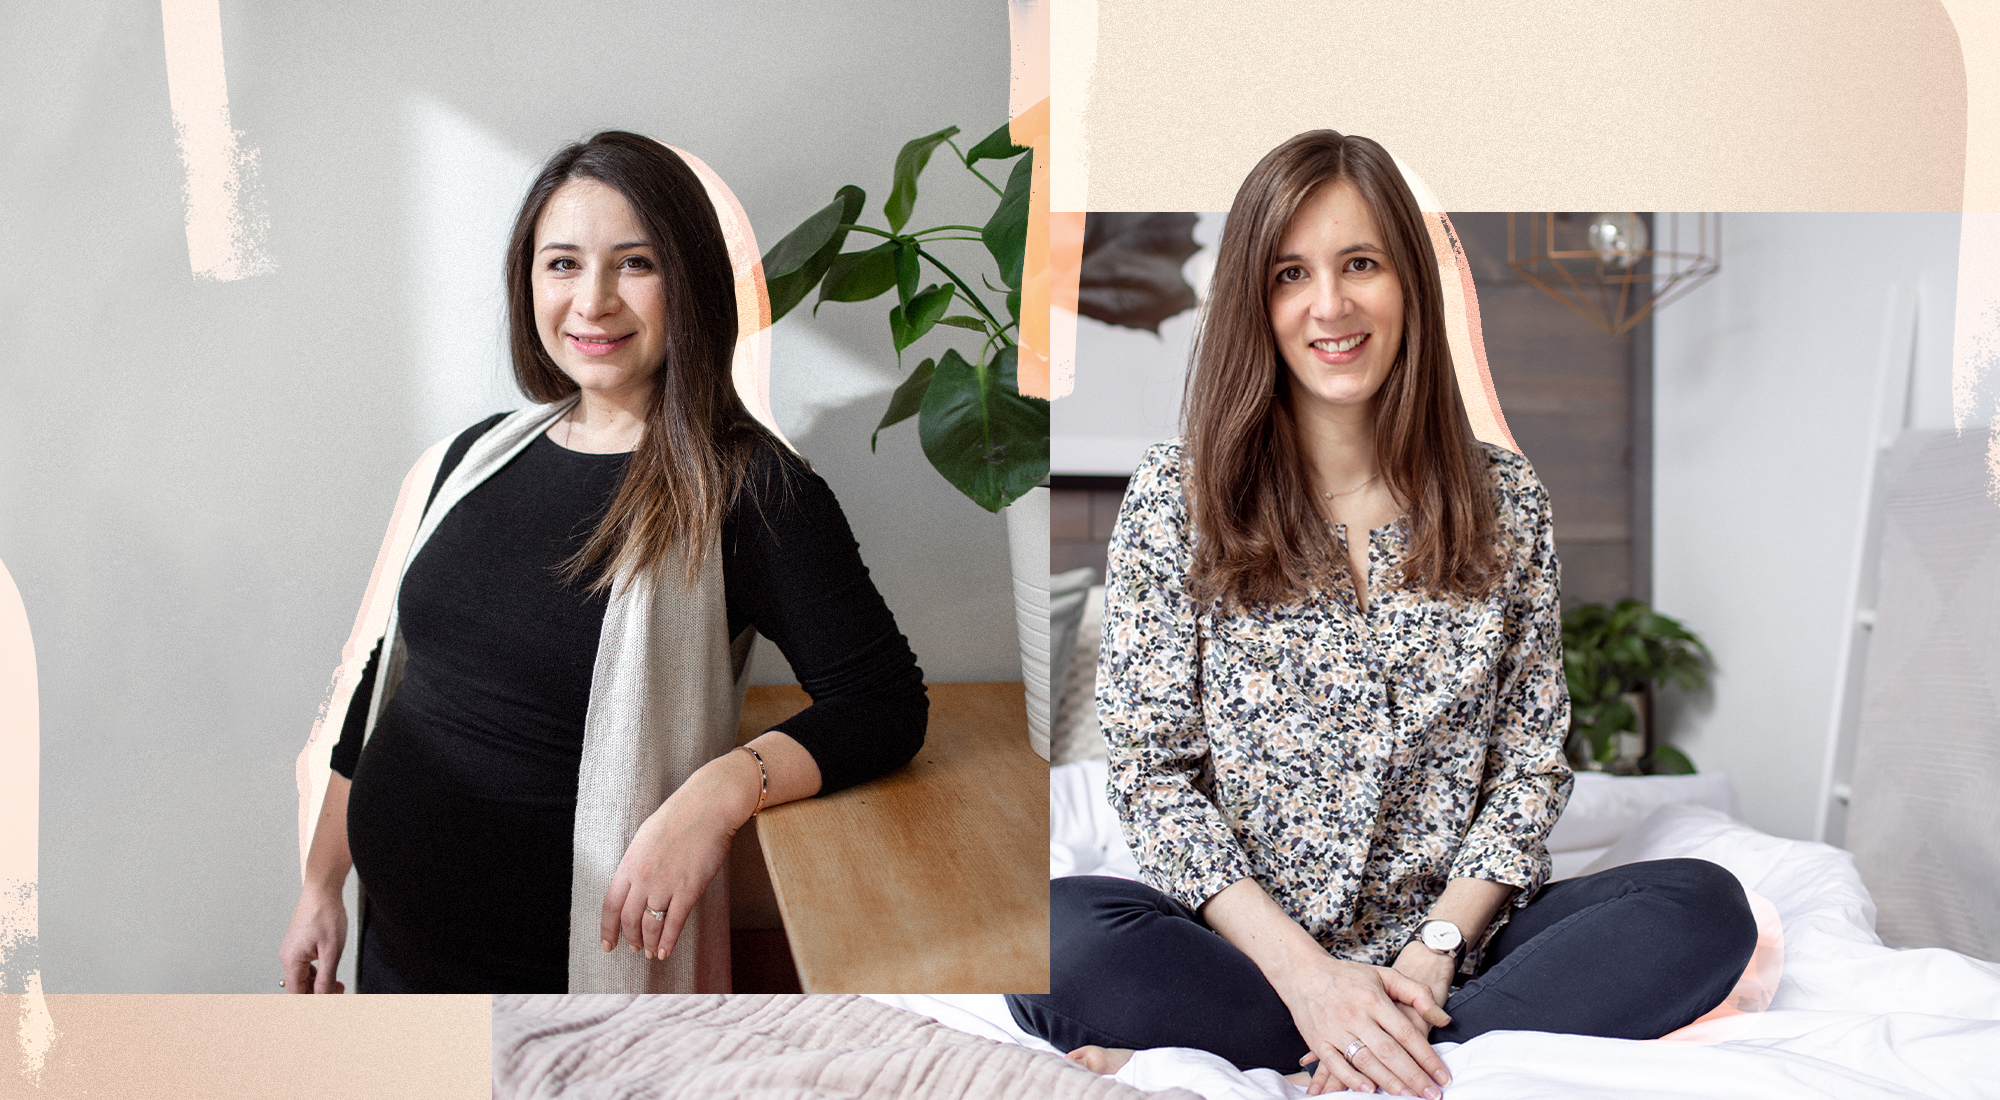 Alexandra Voyevodina (left) and Violette Coquatrix (right); (Photo: Chris Pangan; graphic design: Cat Walrond)